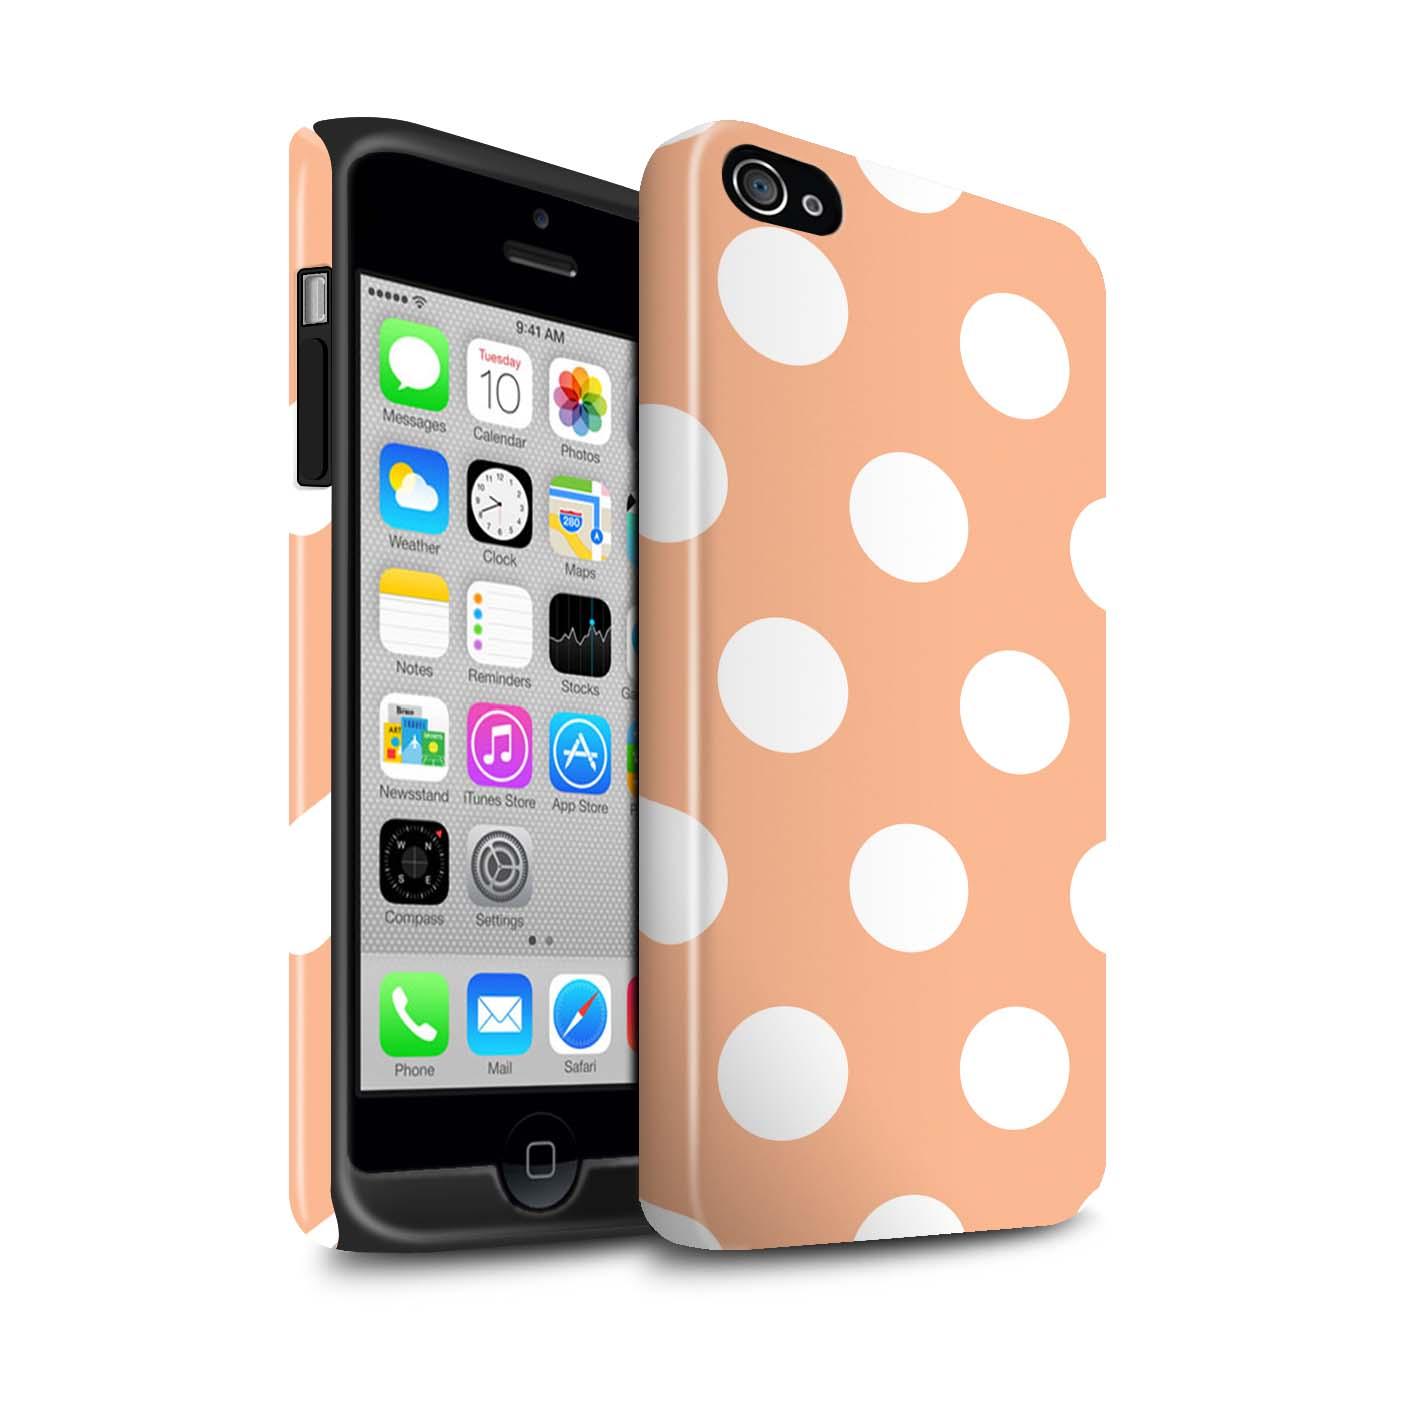 STUFF4-Coque-Robuste-Brillant-pour-Apple-iPhone-Smartphone-Motif-a-Pois-Etui